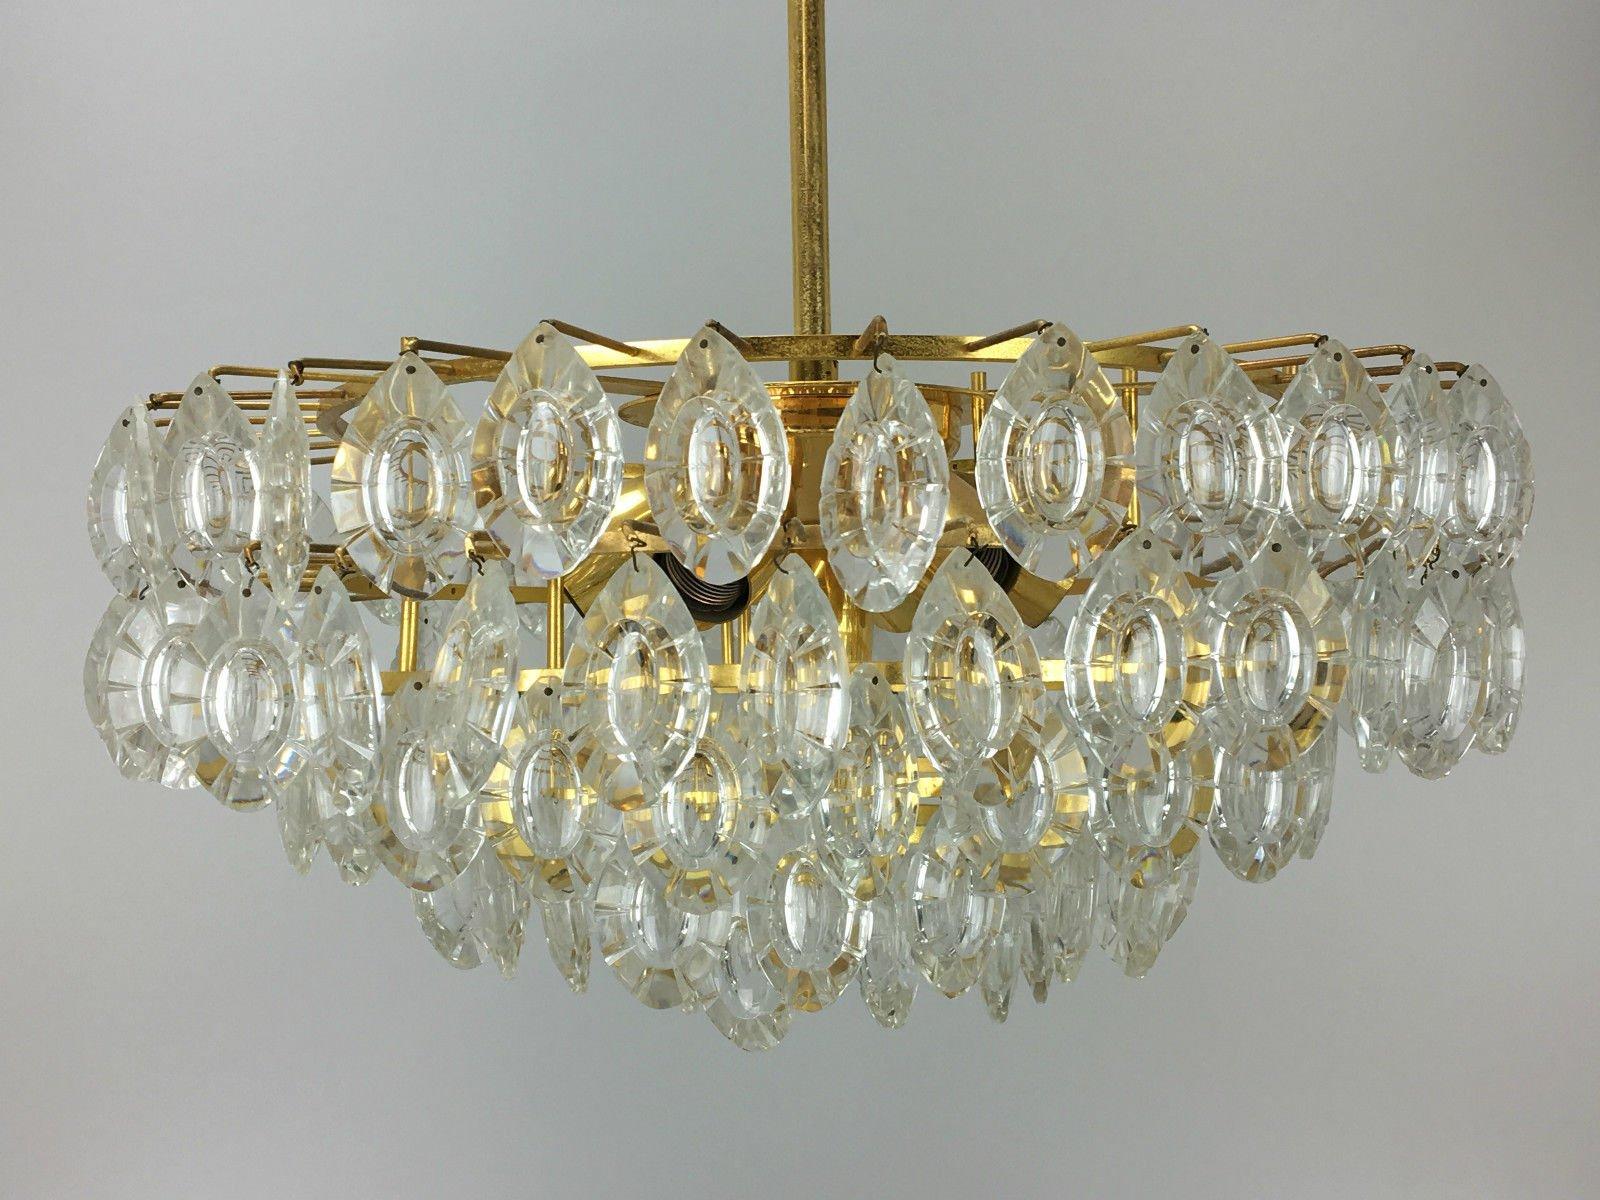 Brass glass chandelier from kinkeldey 1960s for sale at pamono brass glass chandelier from kinkeldey 1960s mozeypictures Gallery